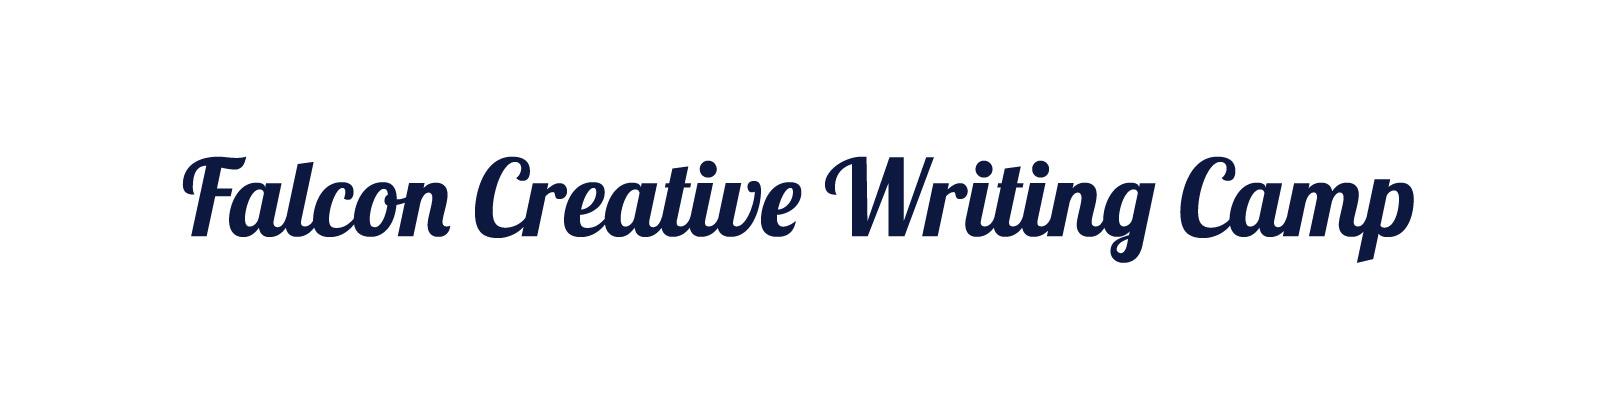 creative writing titles